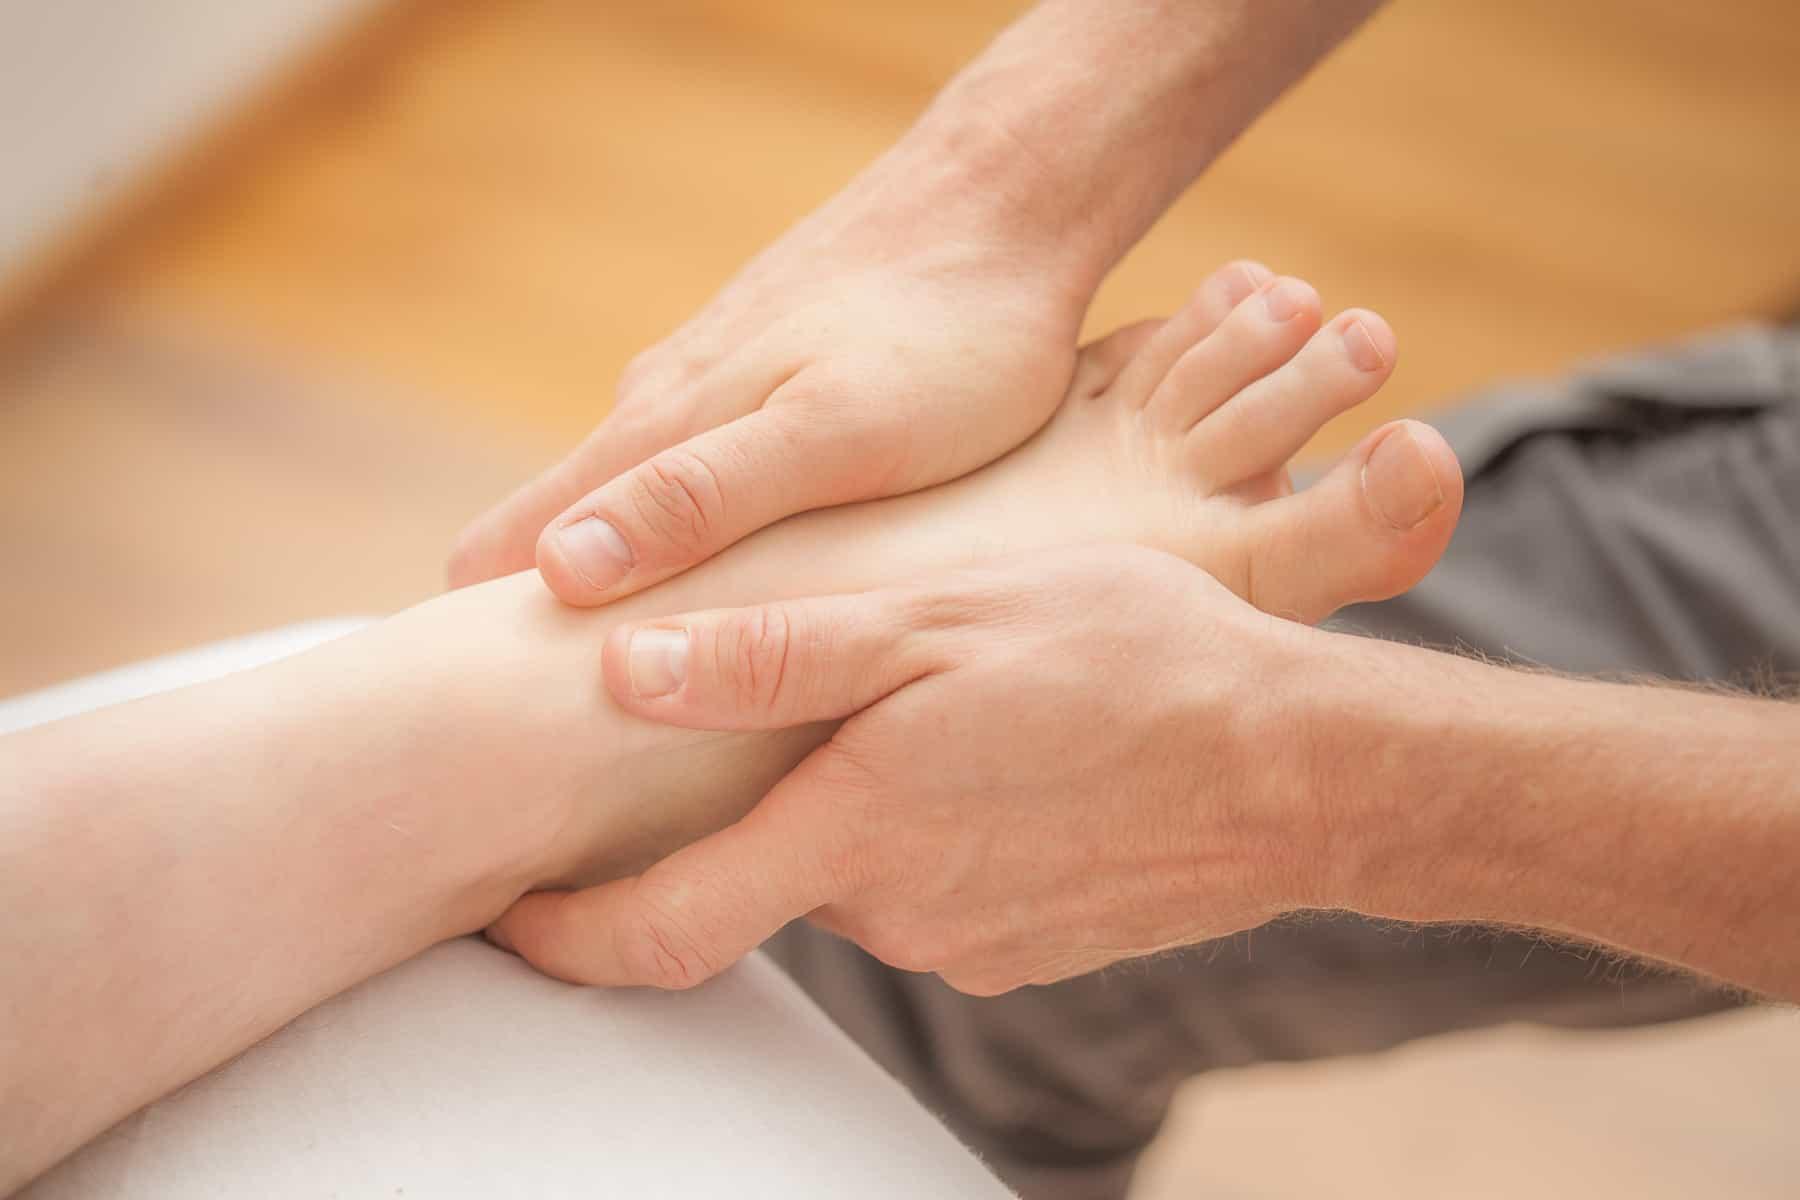 Dorn Therapie - Naturheilpraxis Cyrill Past